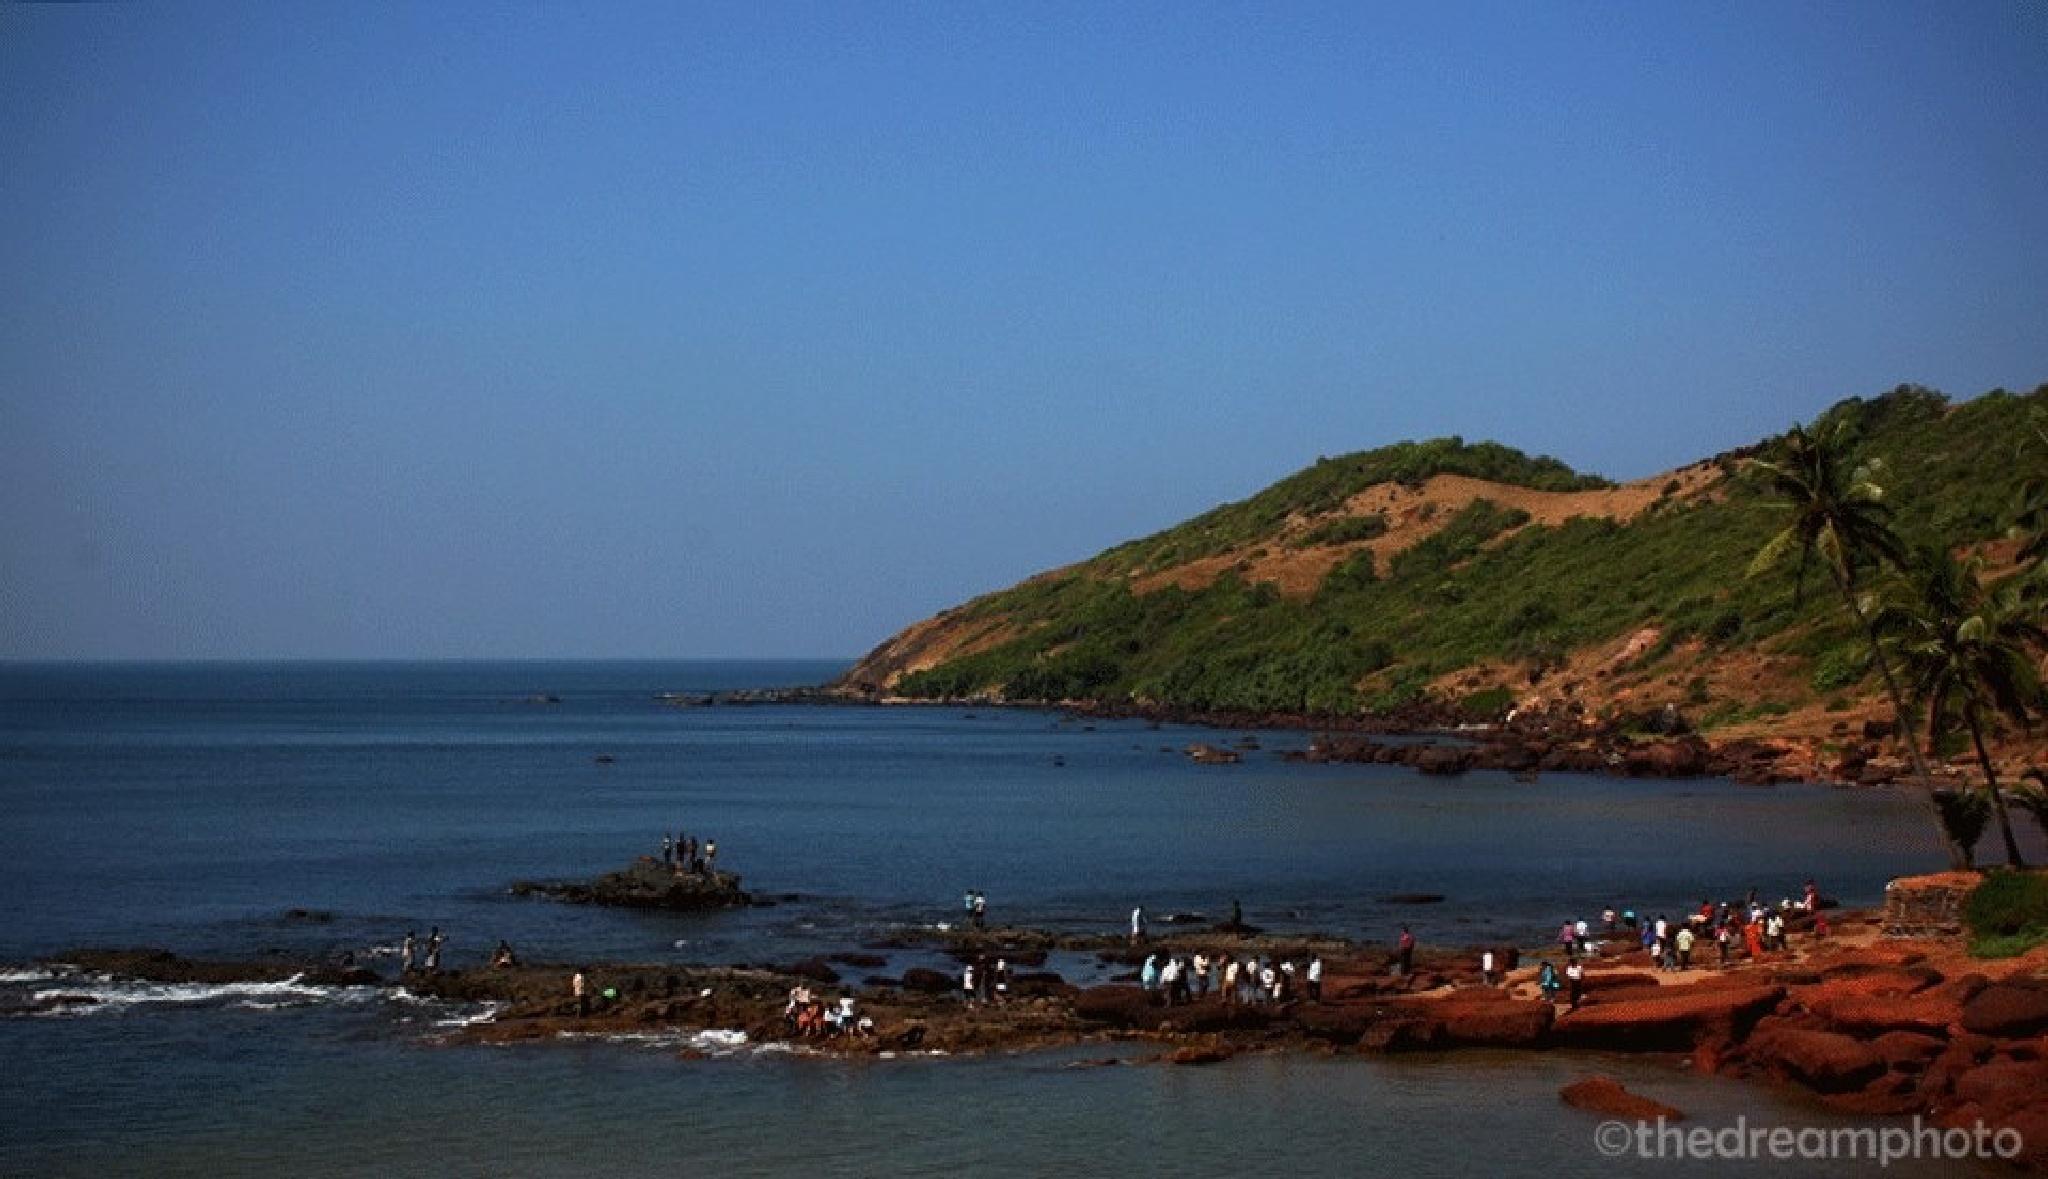 A beach in Goa by Sushil Dhanawde